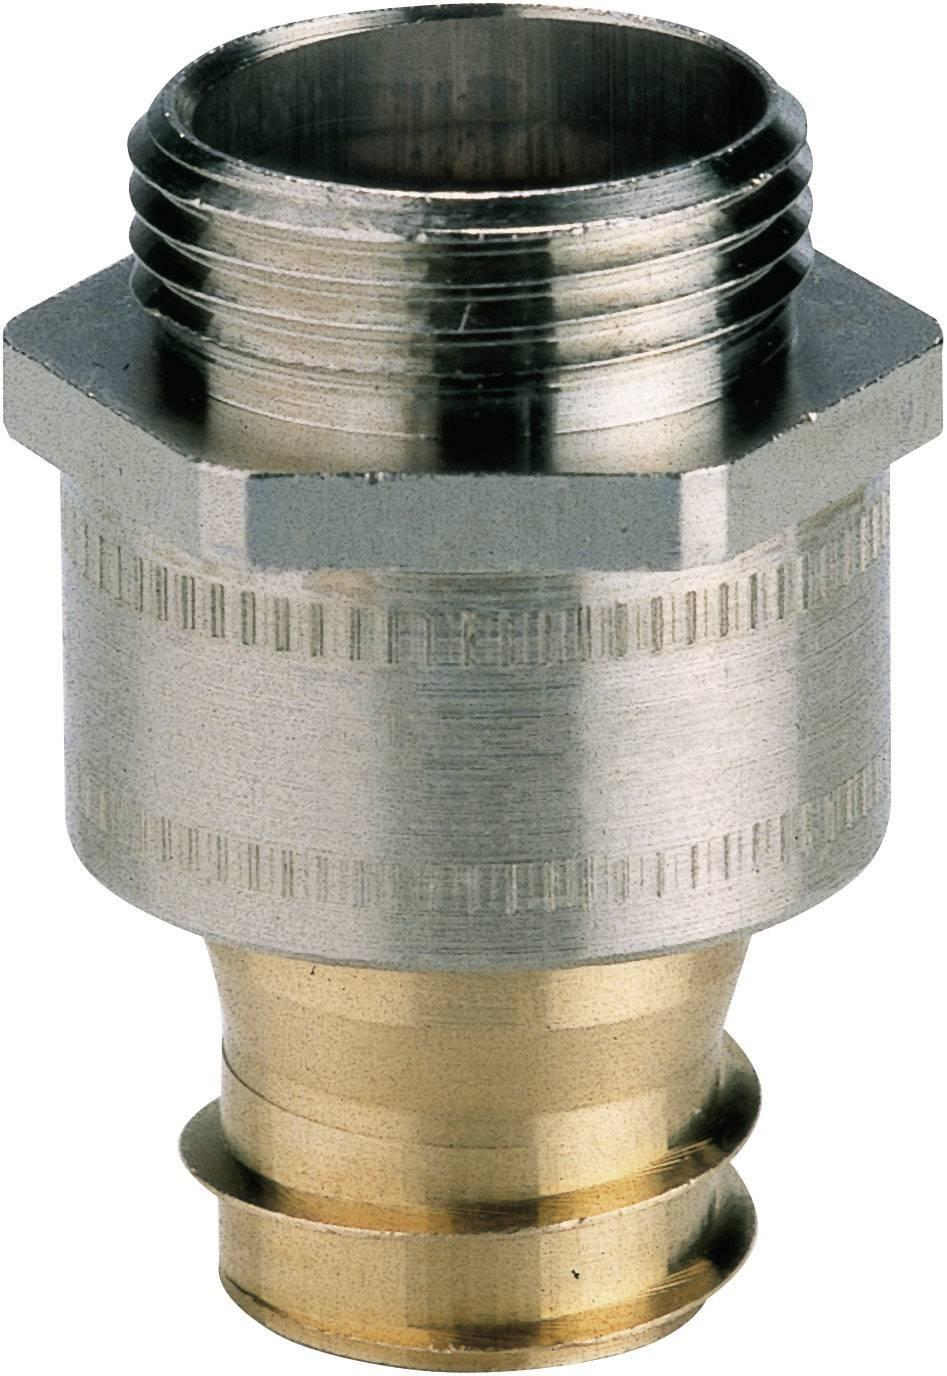 Šroubový spoj kovový LappKabel SILVYN LI-M 12x1,5 SGY (61802370)